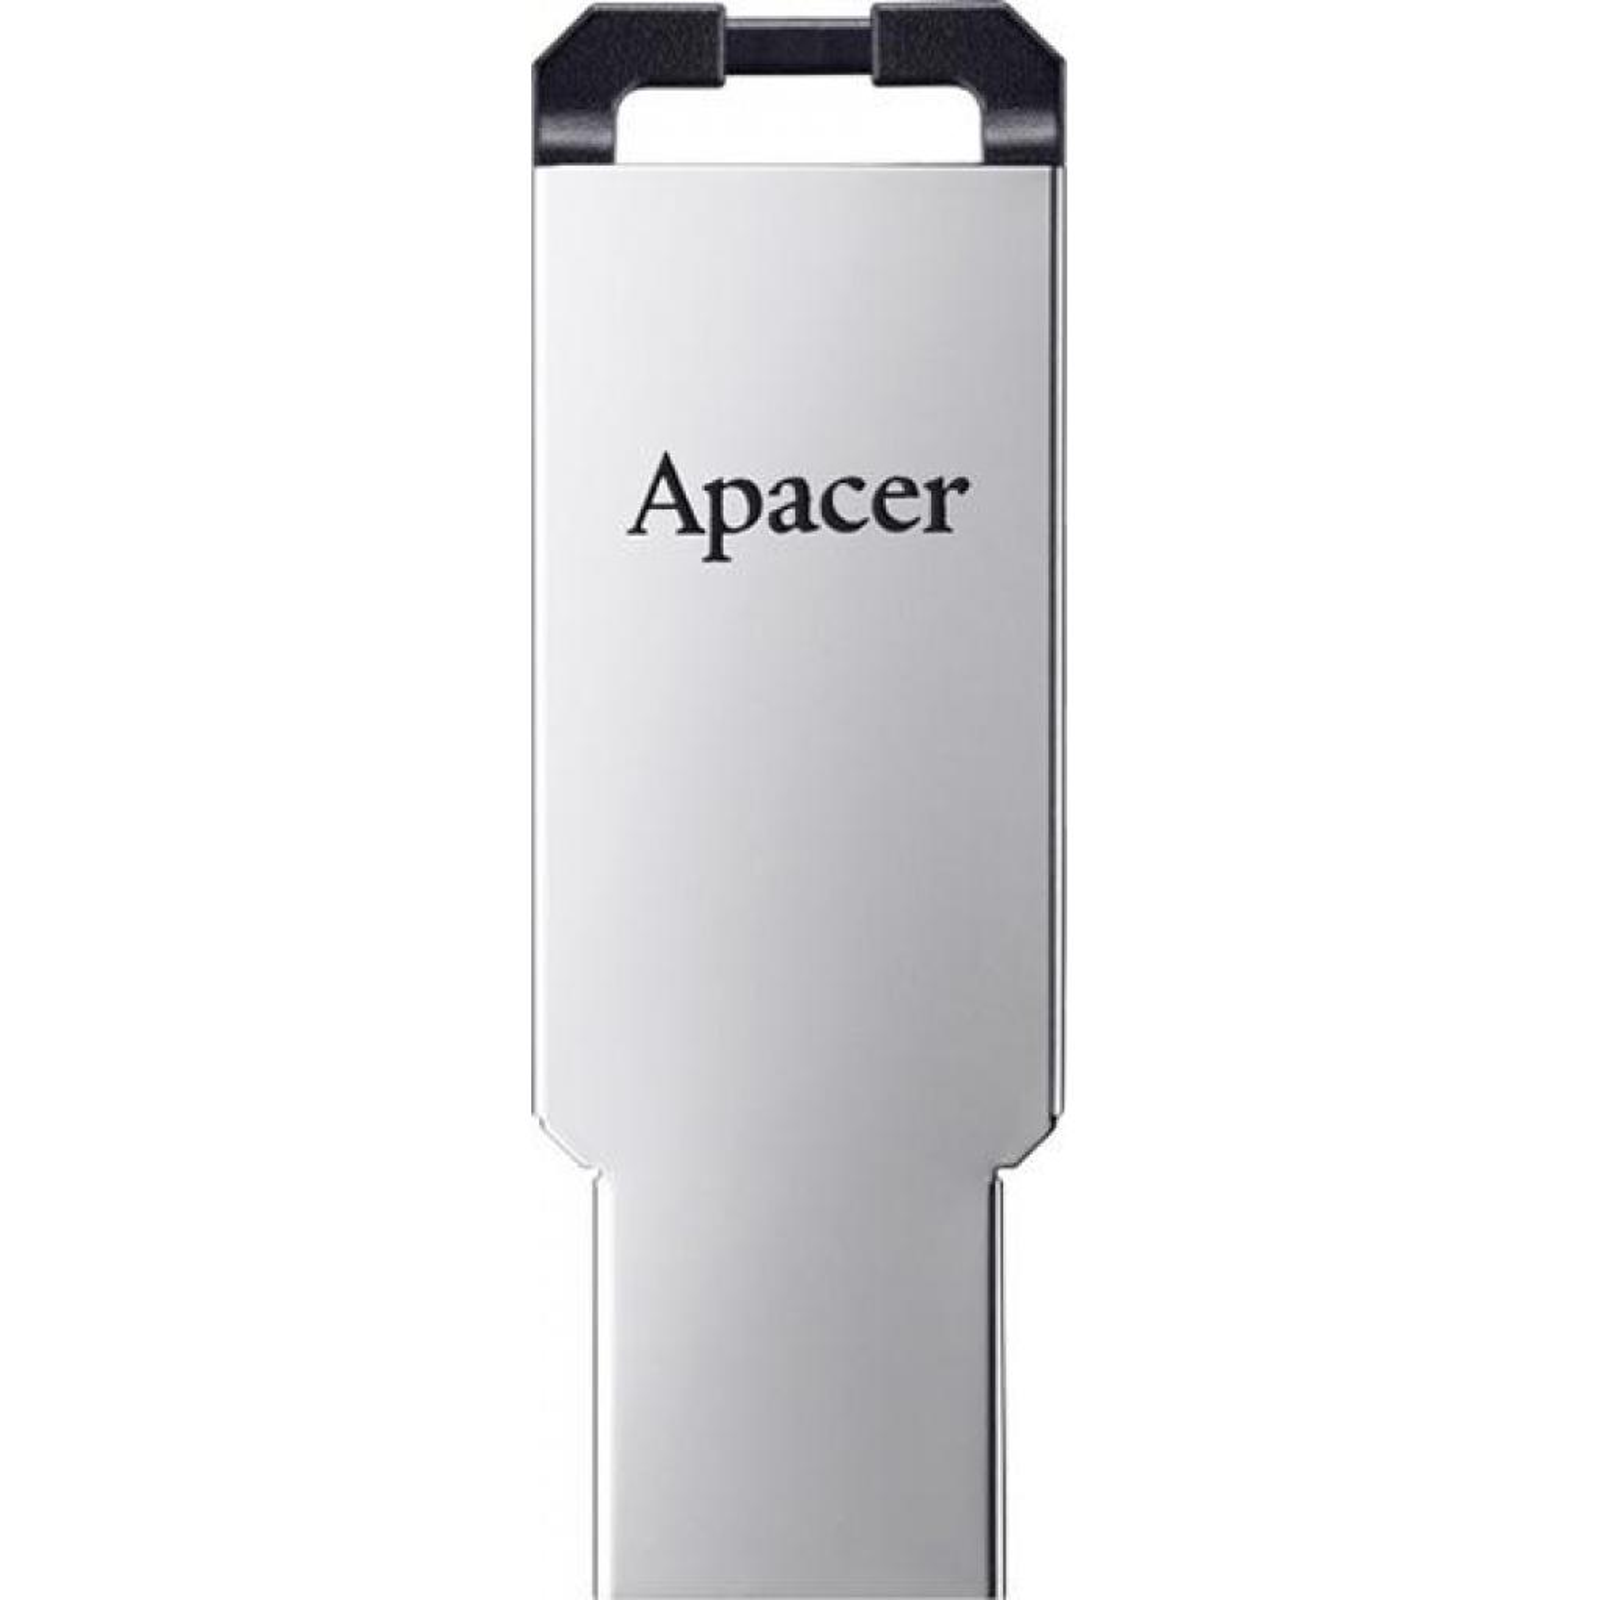 USB флеш накопитель Apacer 16GB AH310 Silver USB 2.0 (AP16GAH310S-1)